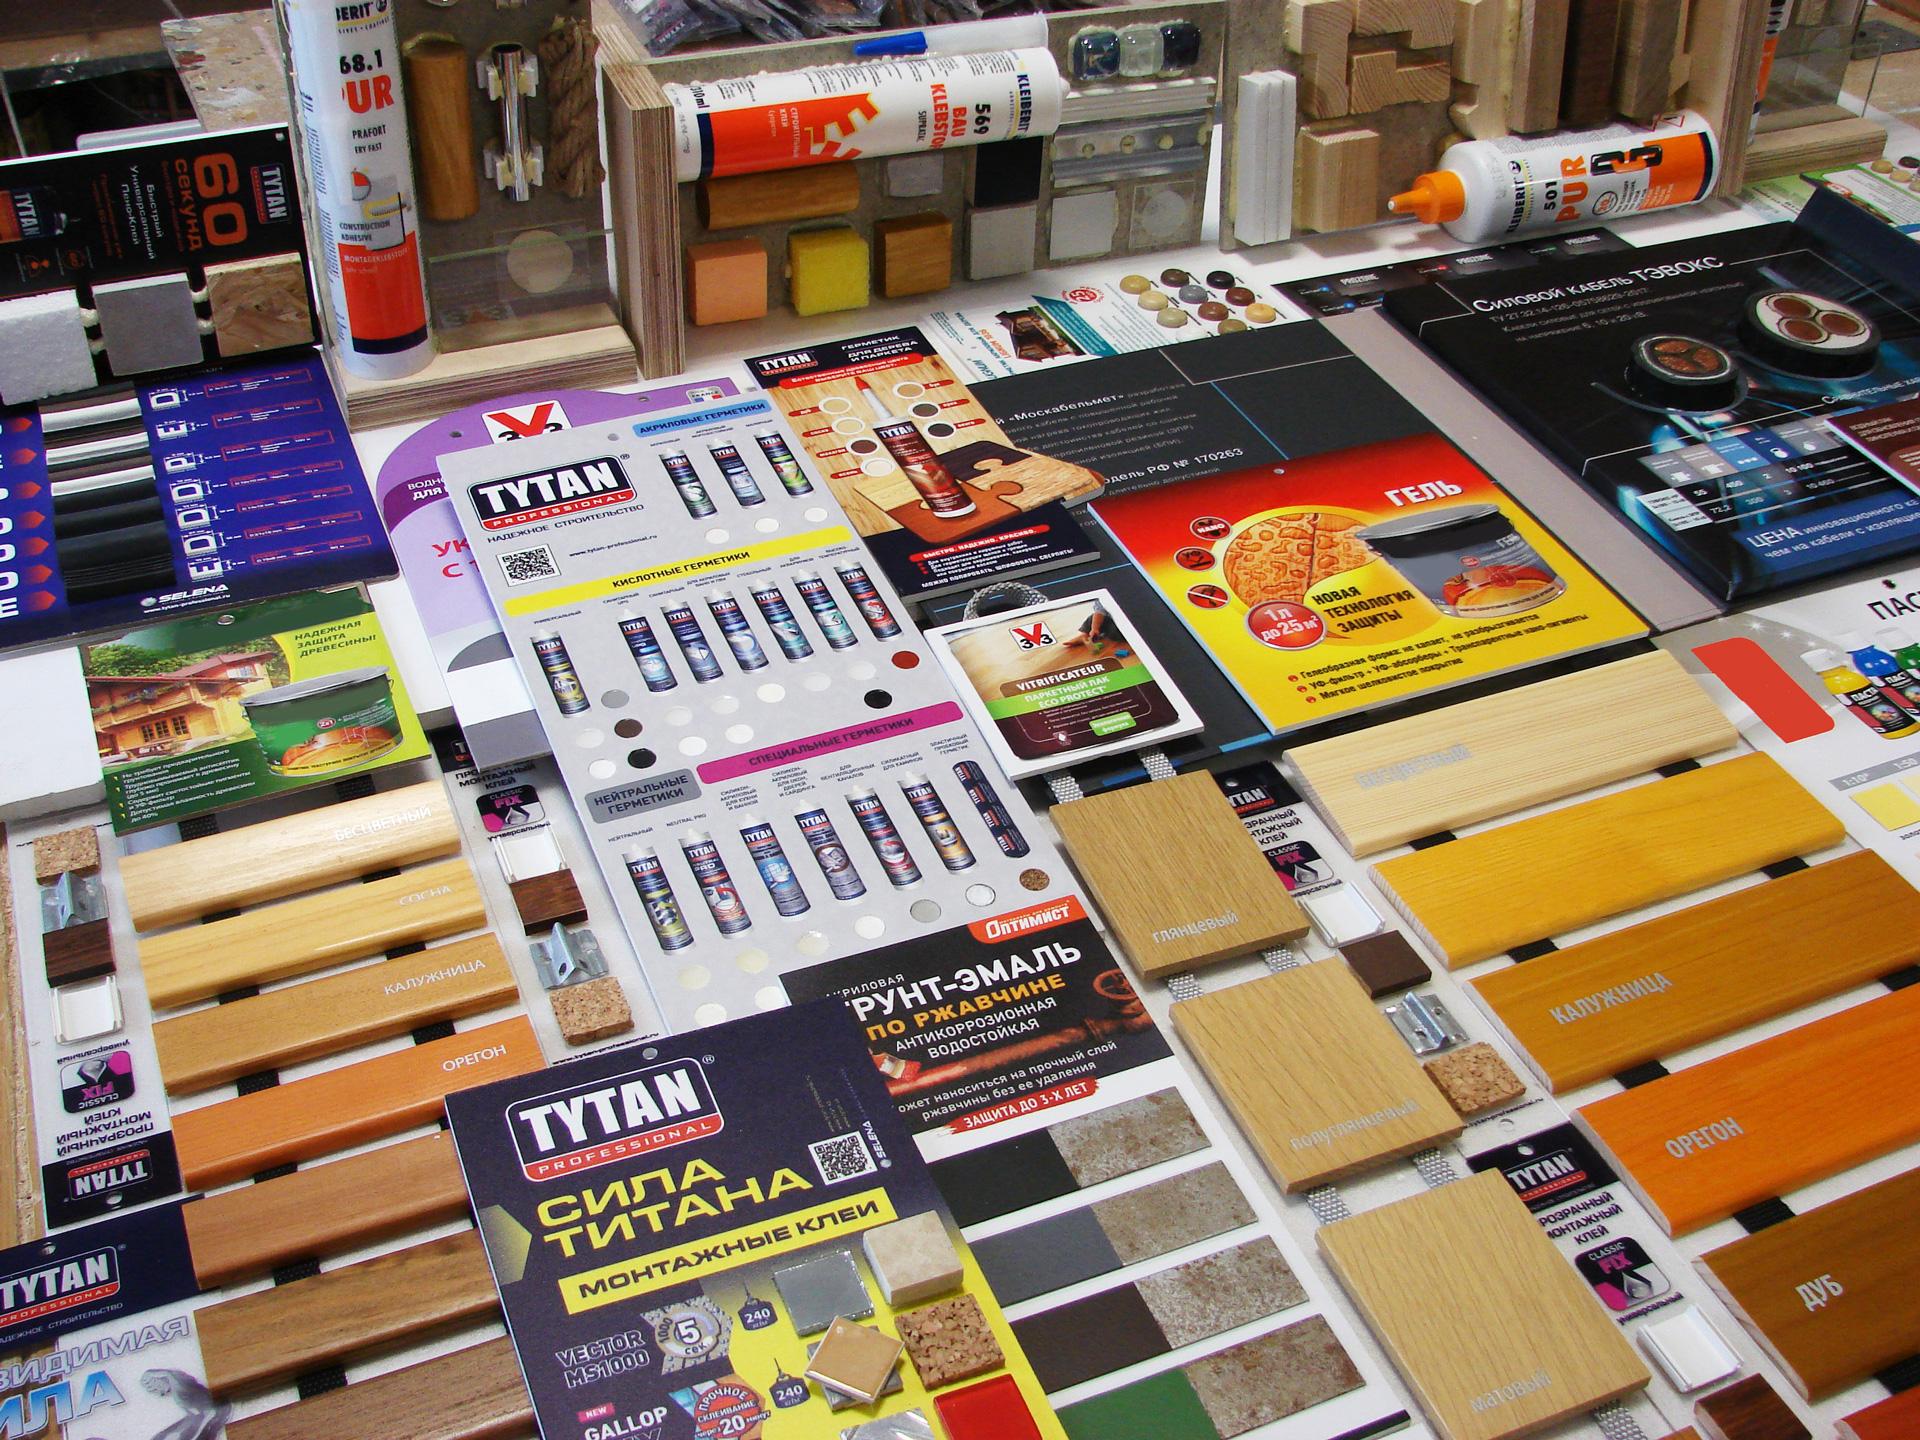 Производство образцов выкрасов (выкрасок) образцы выкрасов (выкраски) по дереву, пластику, металлу